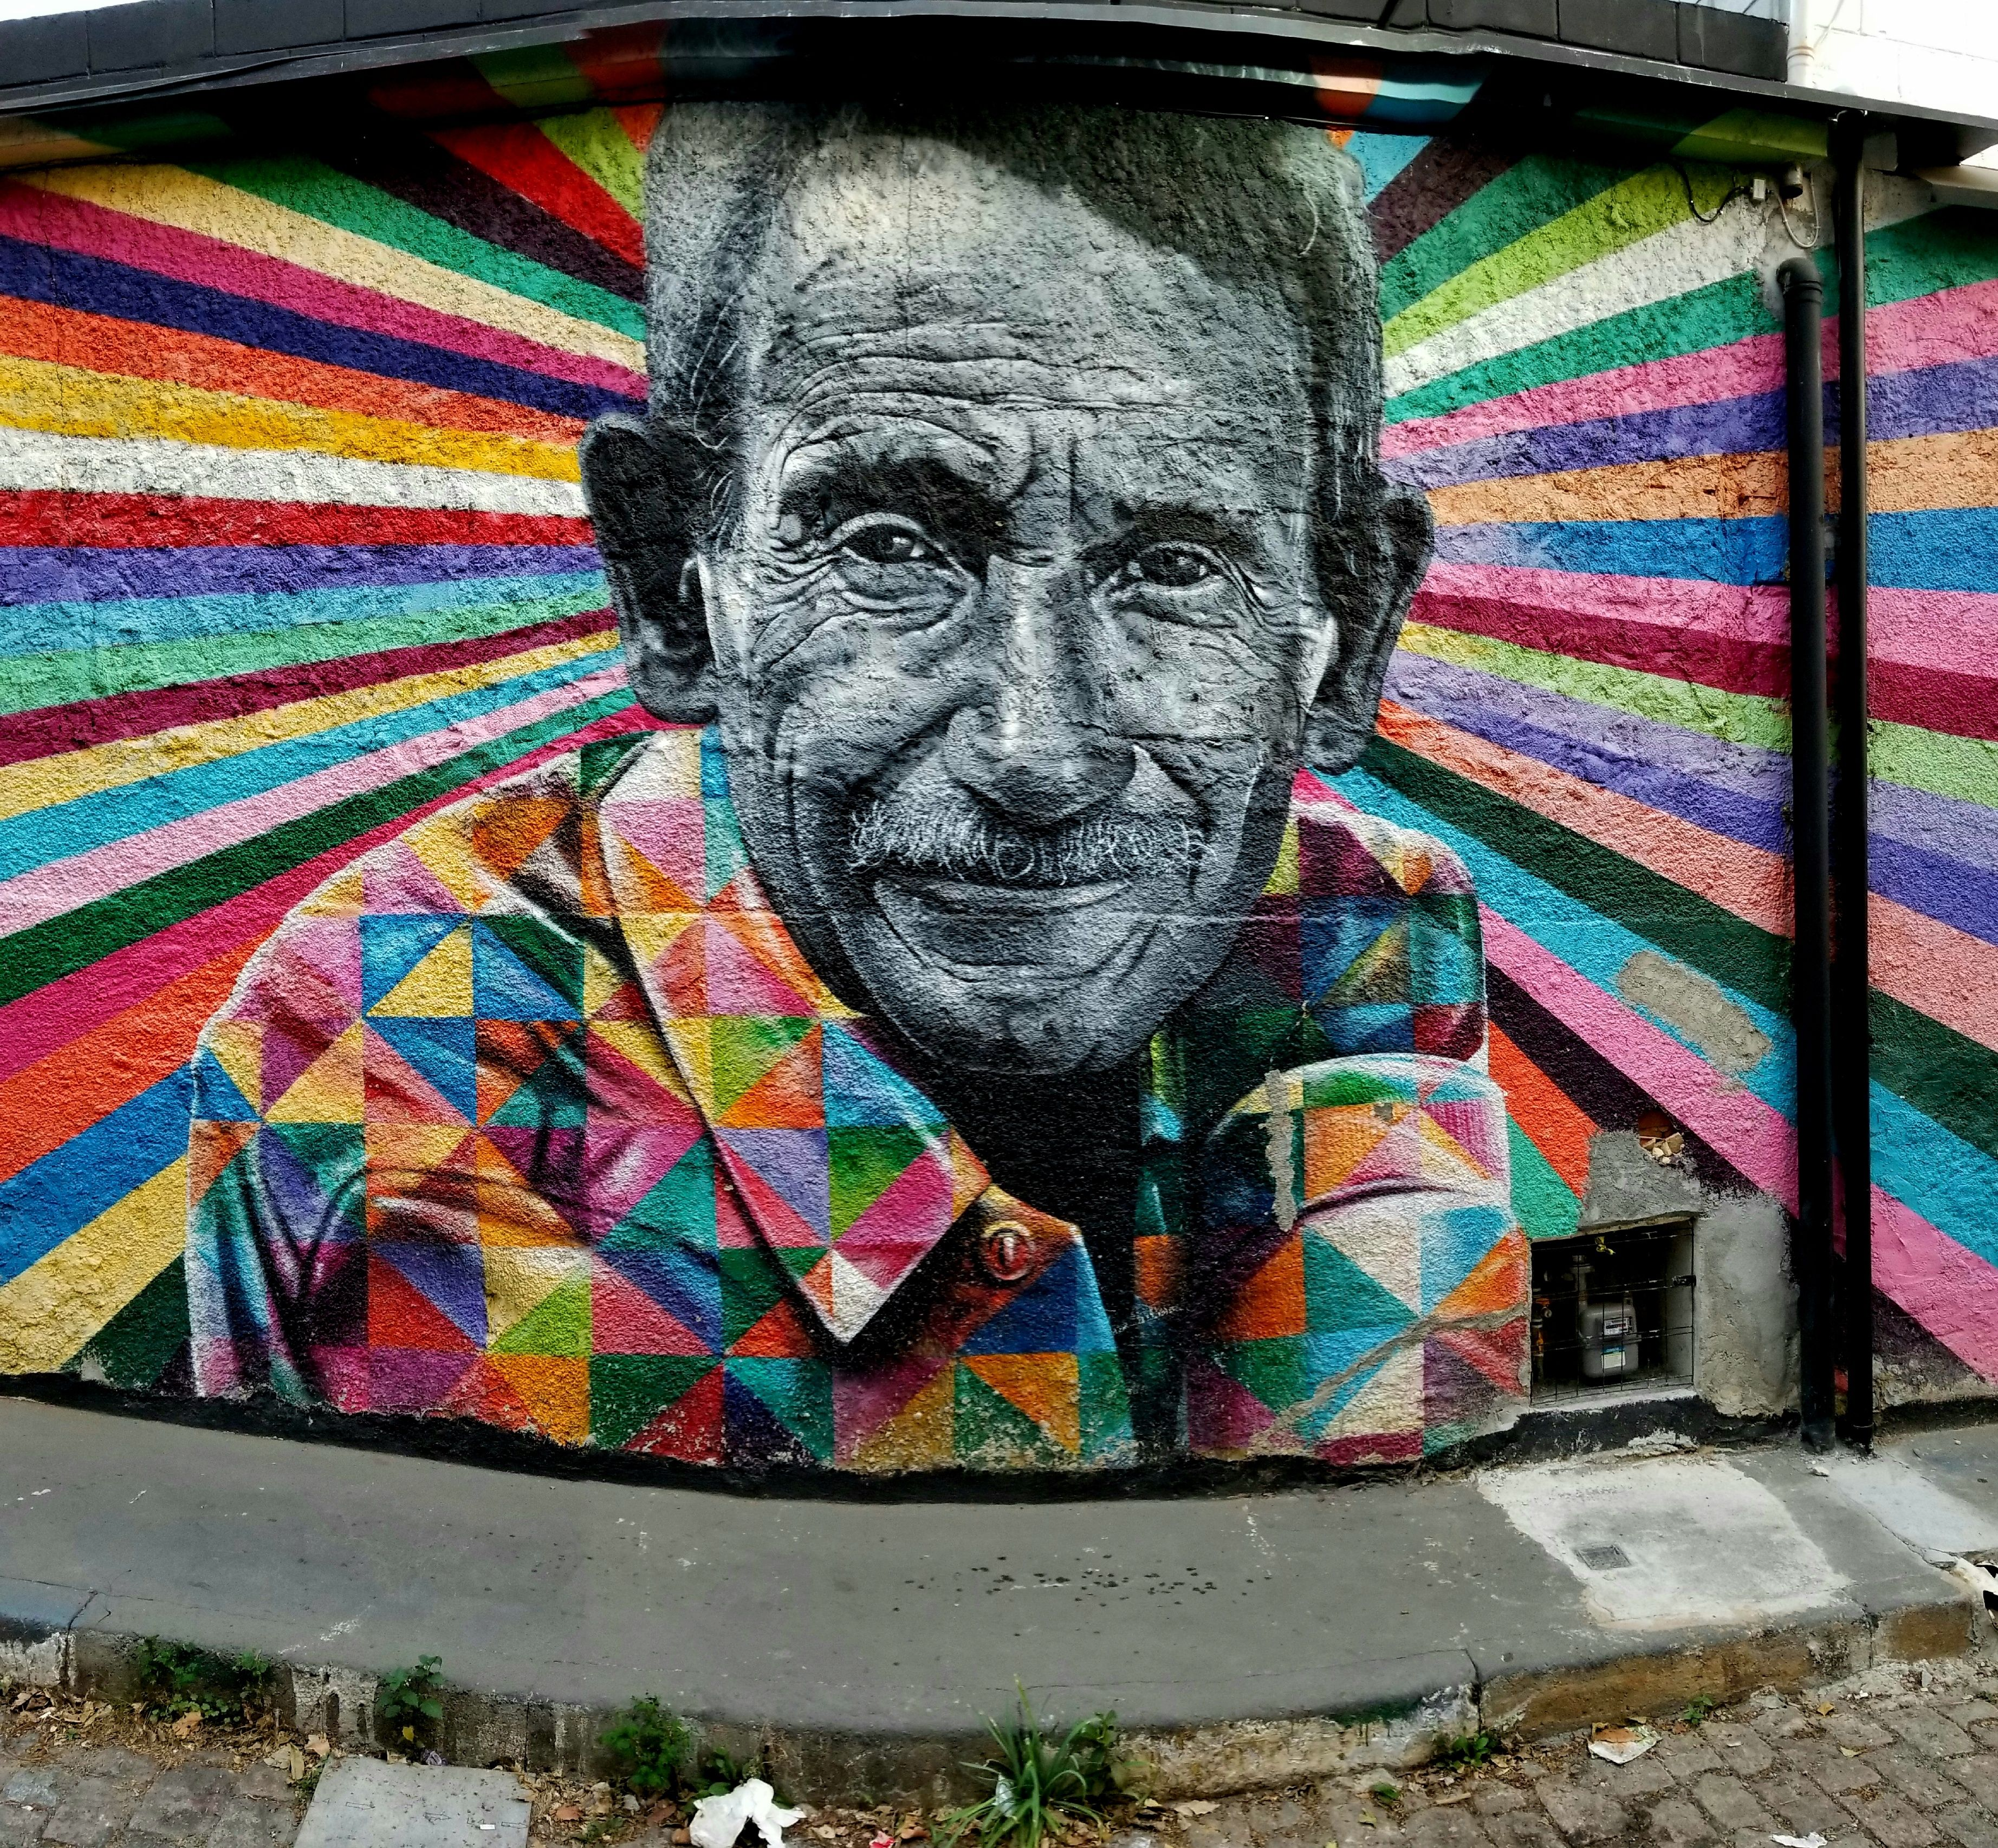 S O Paulo, Brasil  Amazing Street Art & Graffiti